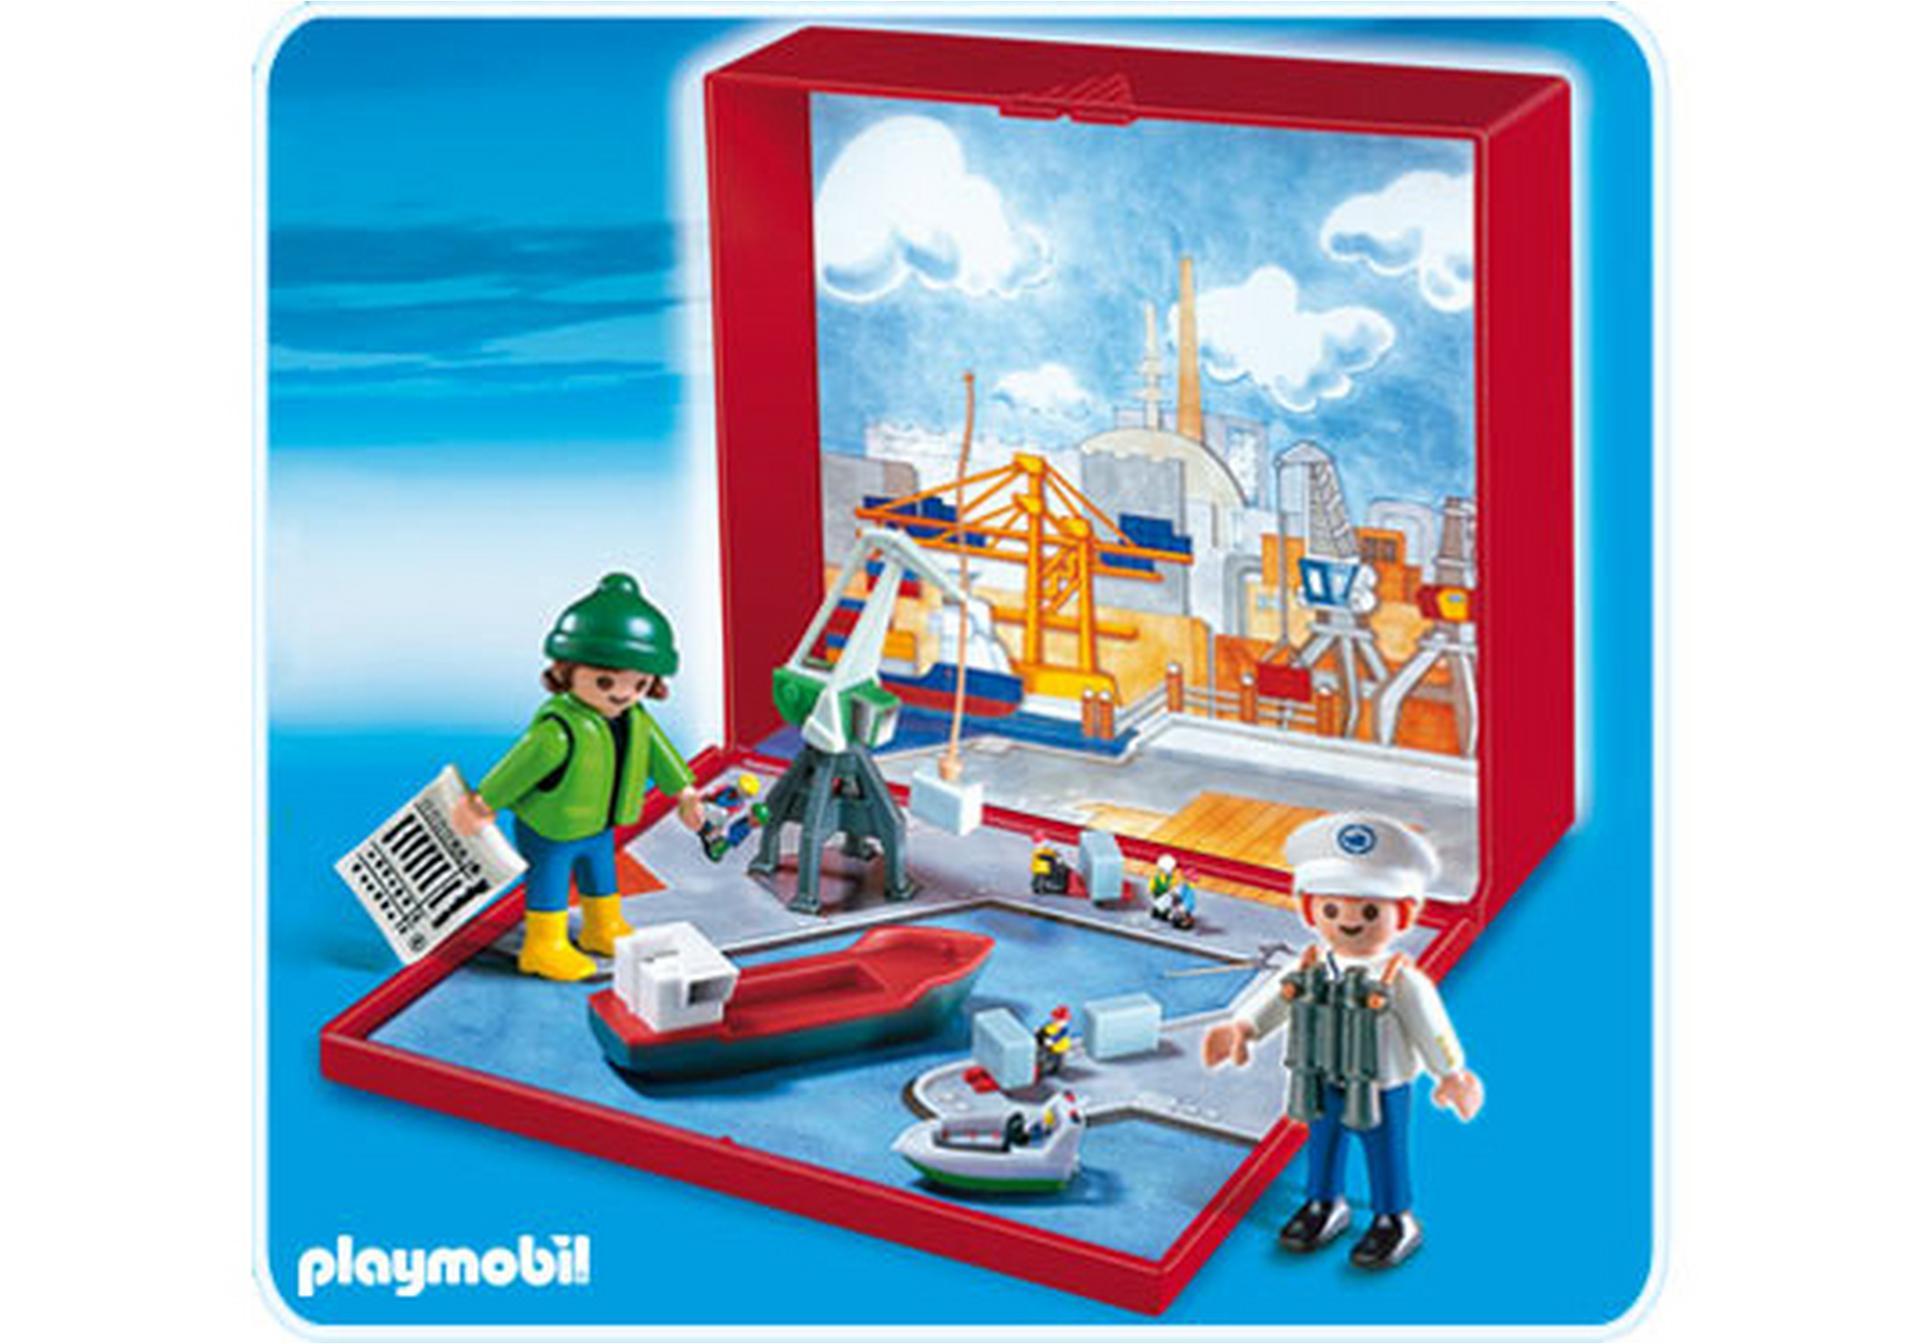 Micro playmobil port 4337 a playmobil france for Micro playmobil